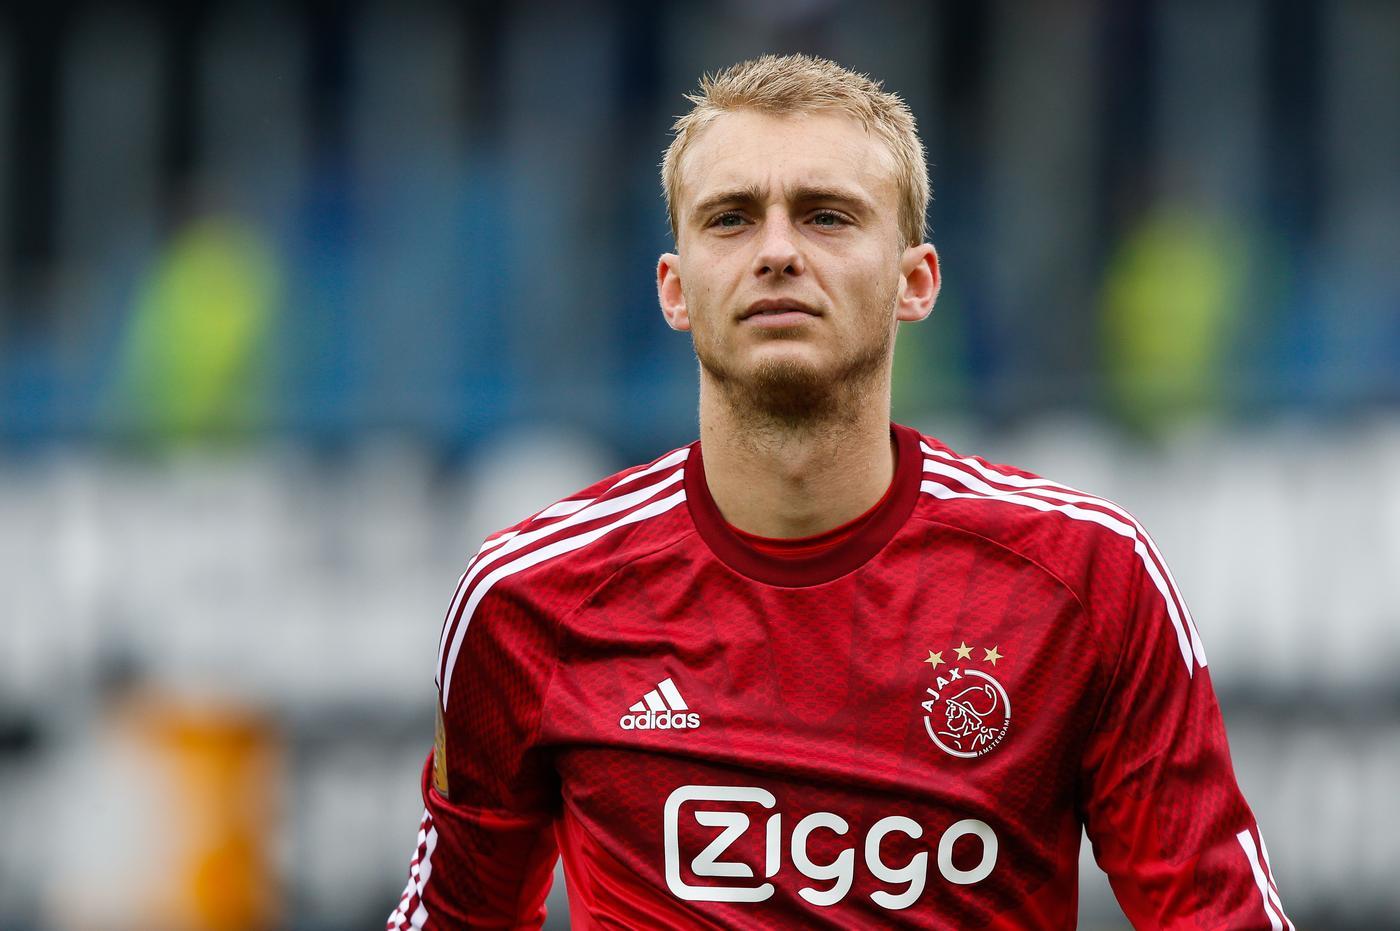 Manchester United target Jasper Cillessen could complete transfer, admits Ajax boss Frank De Boer